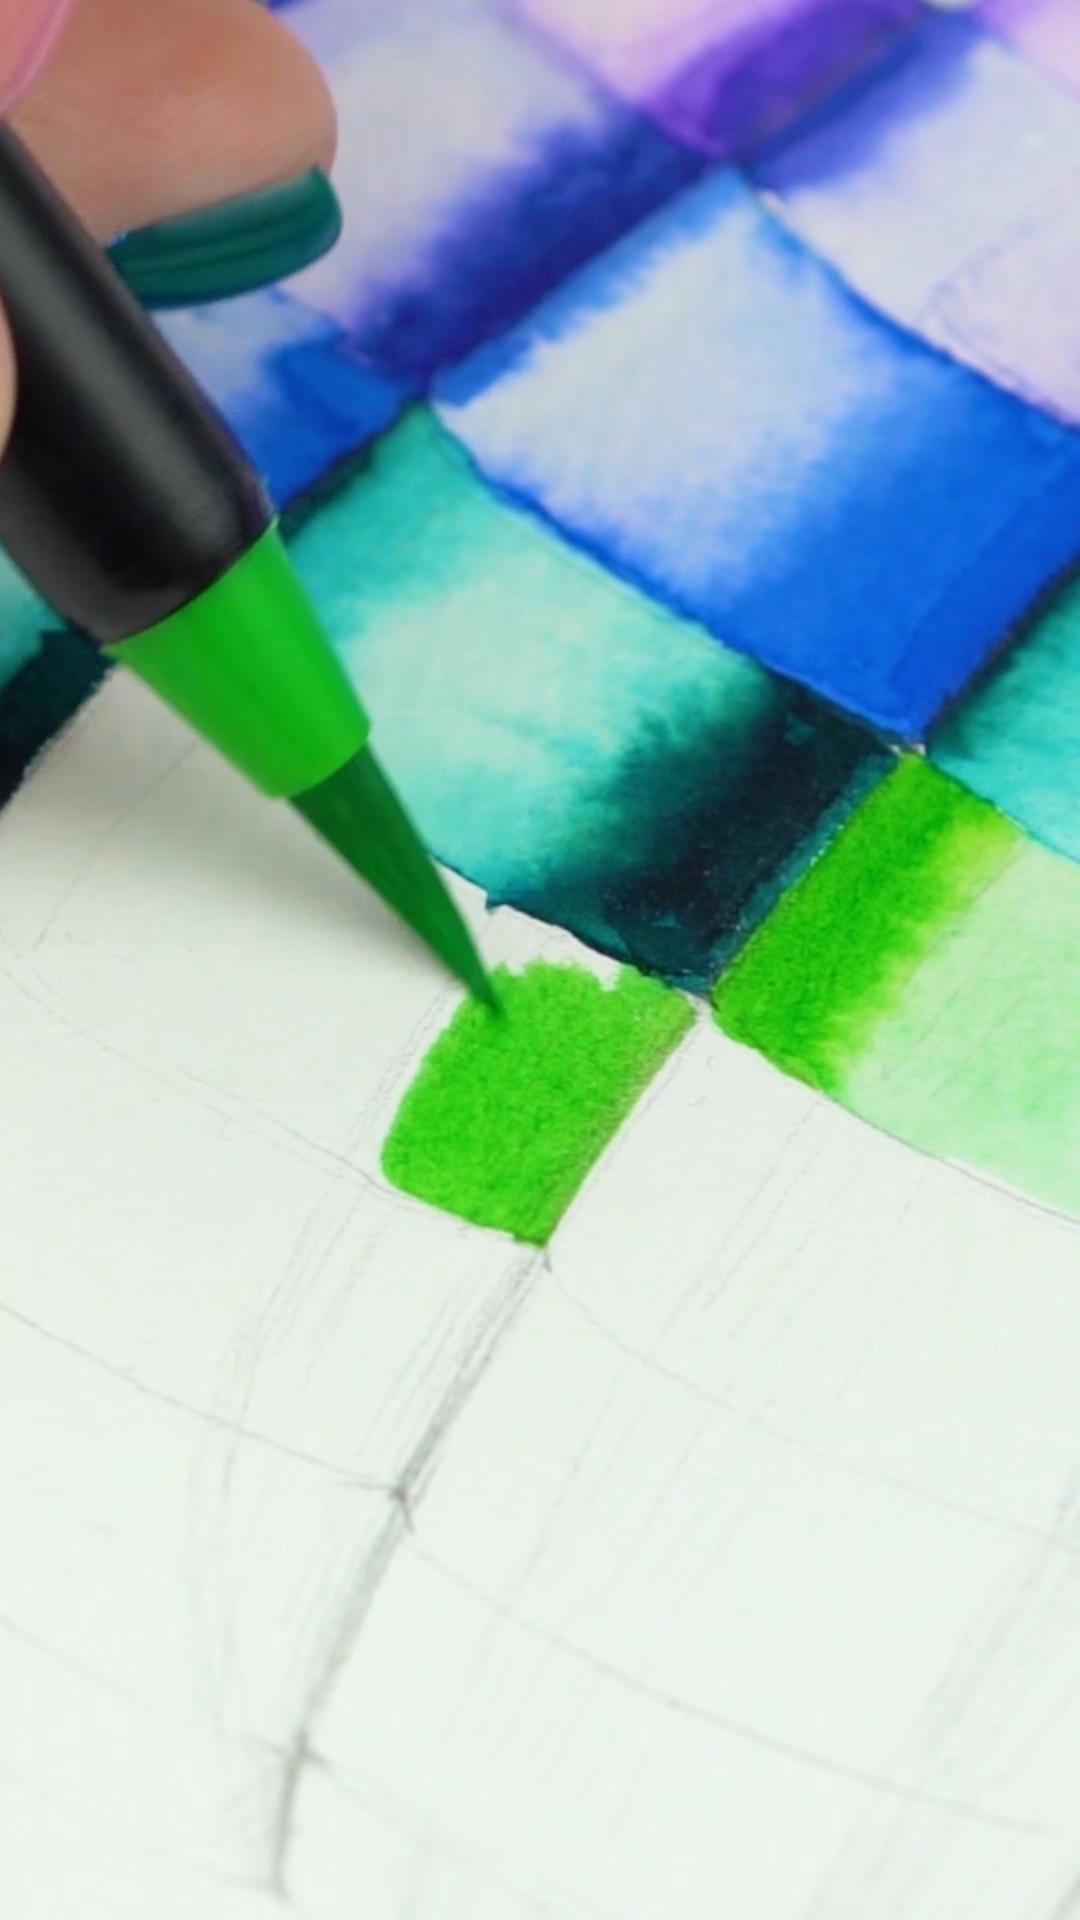 Watercolour Real Brush Pens - Set of 48 [Video] | Brush pen art, Brush pen, Paint brush drawing